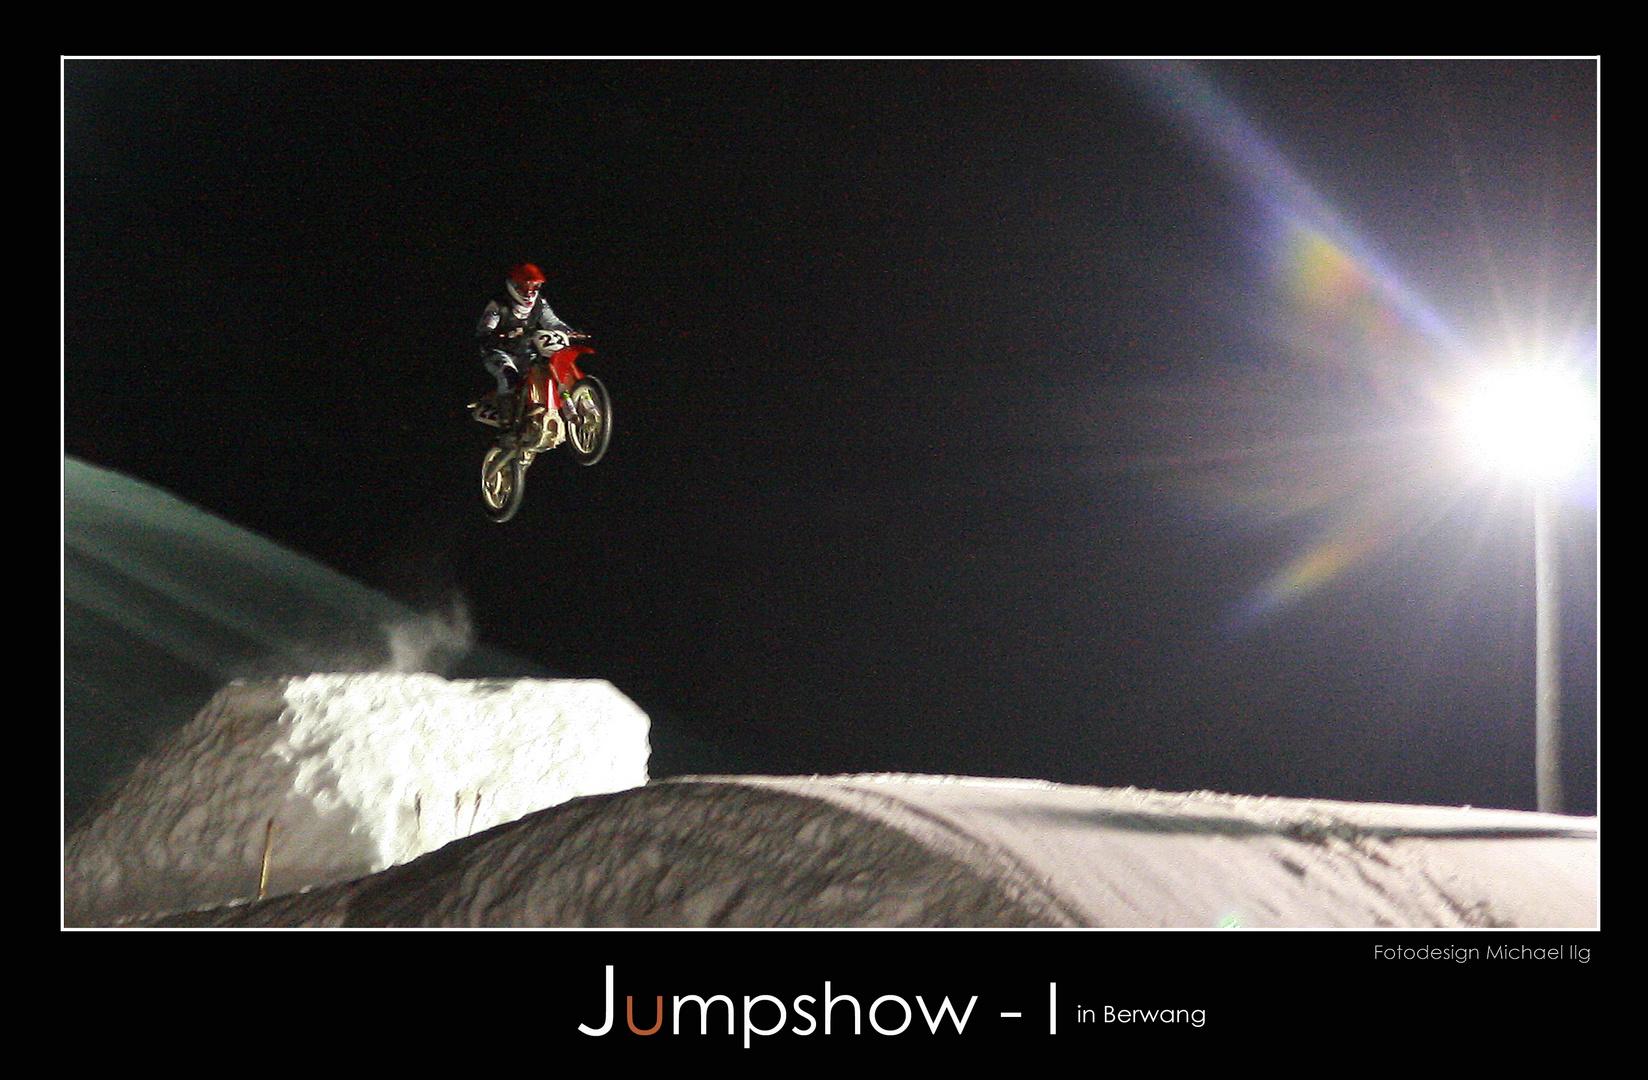 Jumpshow I - Berwang